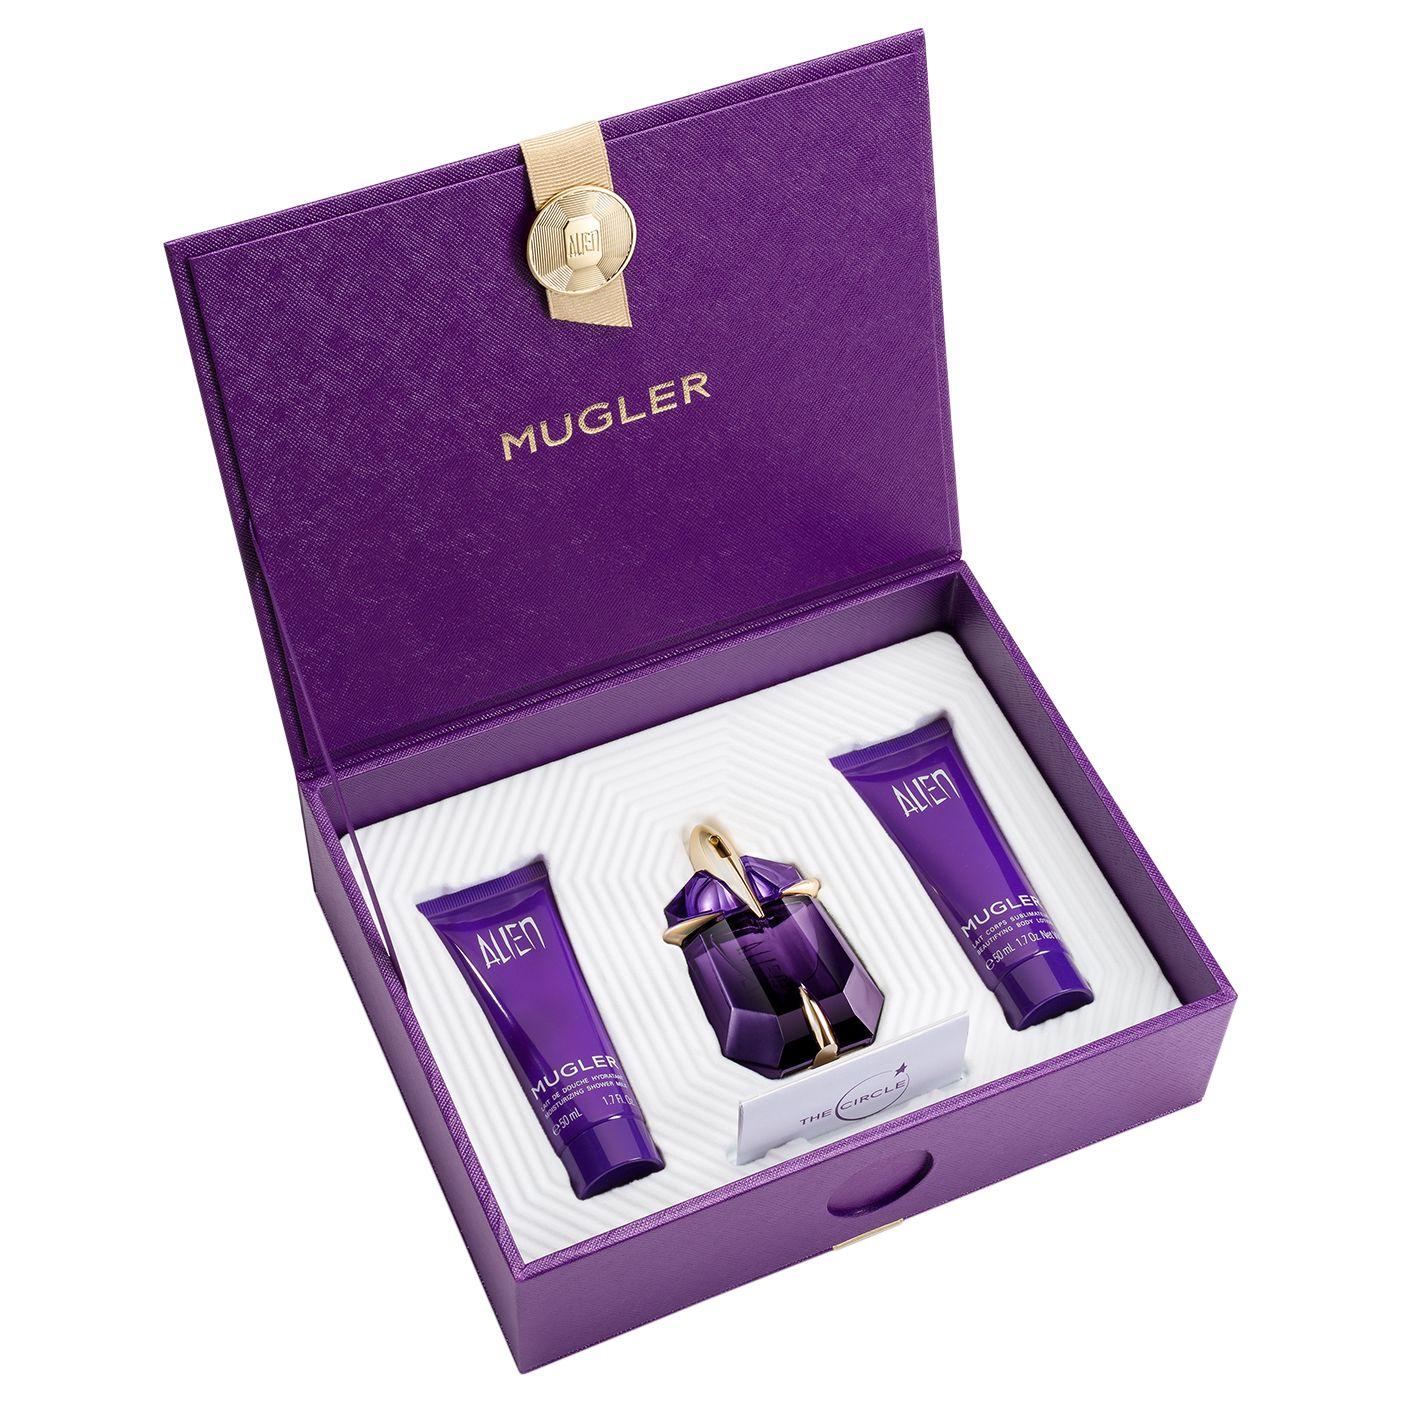 Mugler Mugler Alien 30ml Eau de Parfum Fragrance Gift Set